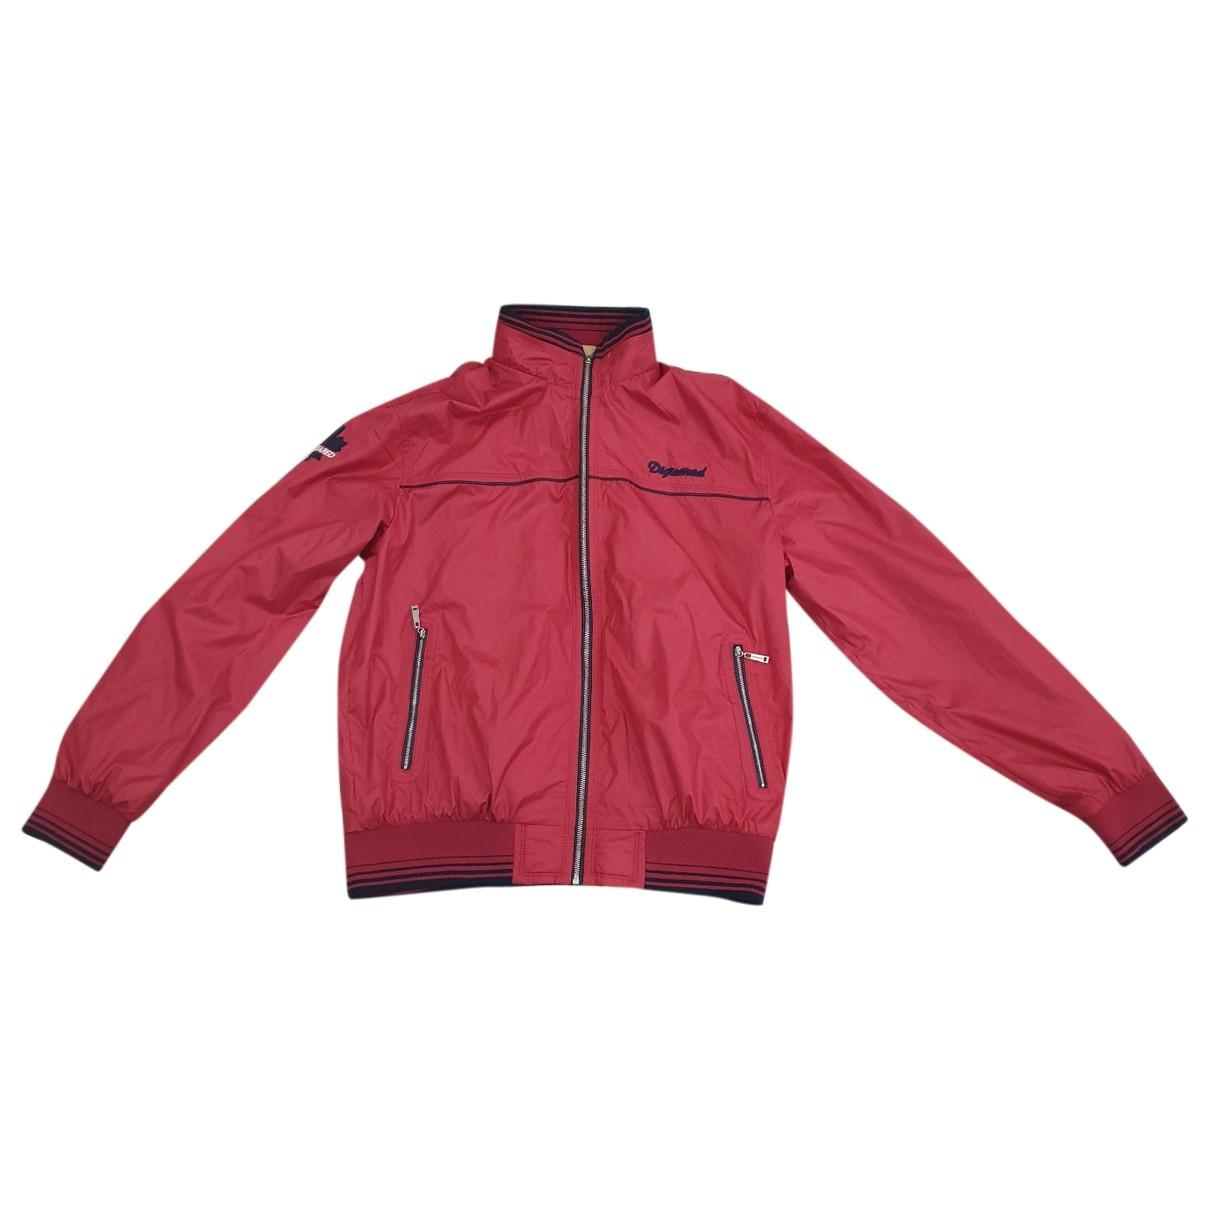 Dsquared2 \N Red Cotton jacket  for Men XL International